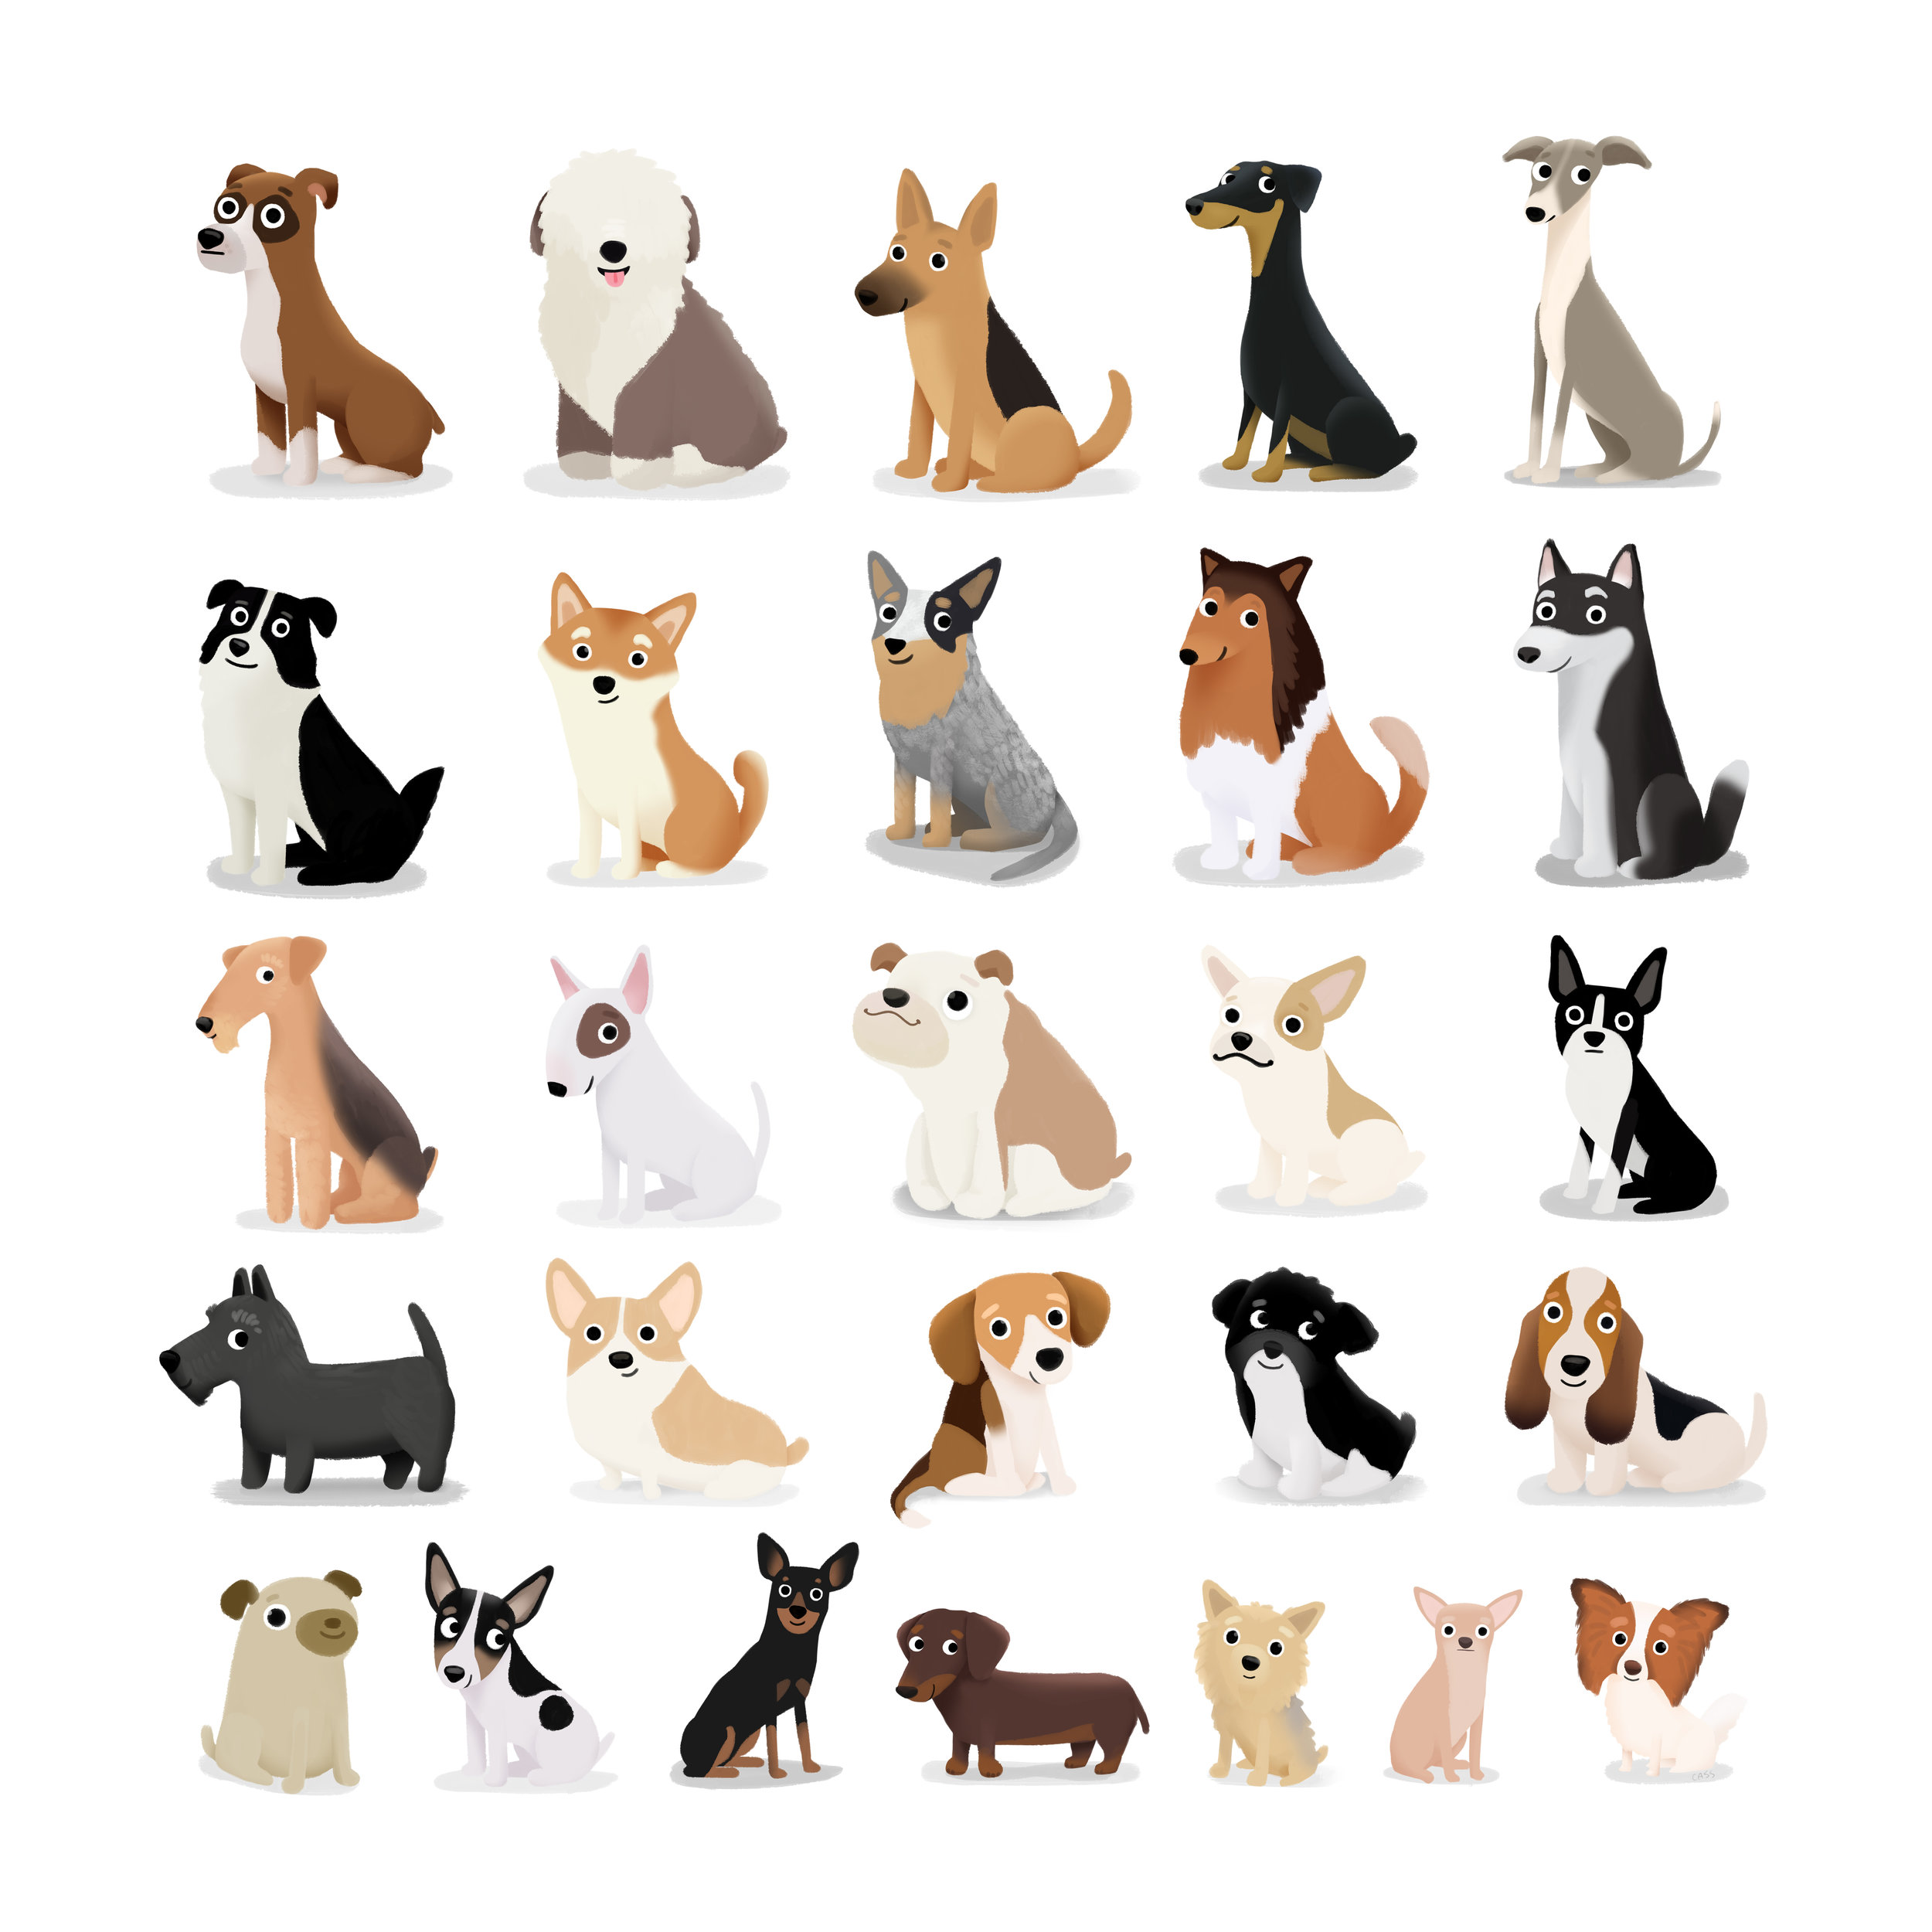 dog_overload_2.jpg